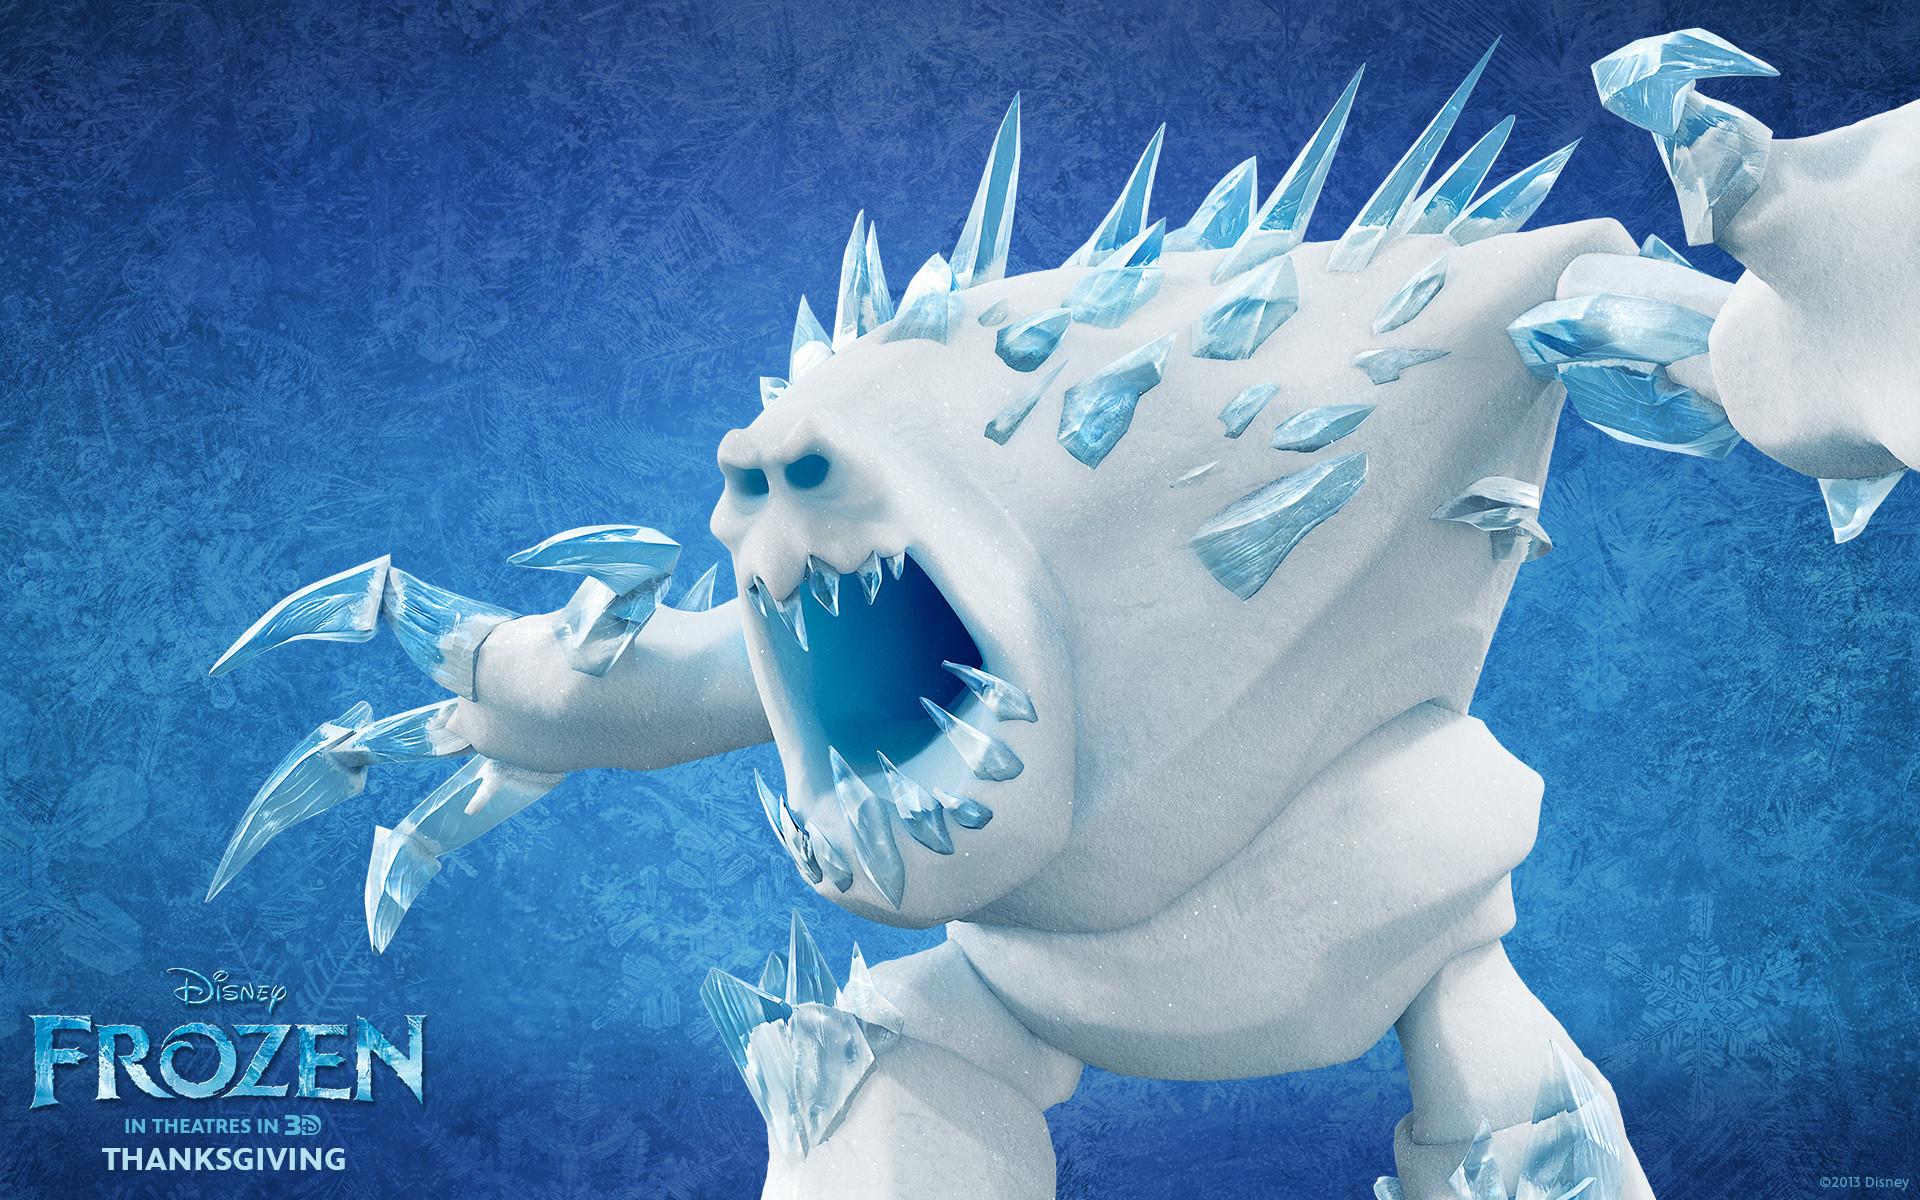 Marshmallow snow creature from Disney movie Frozen wallpaper